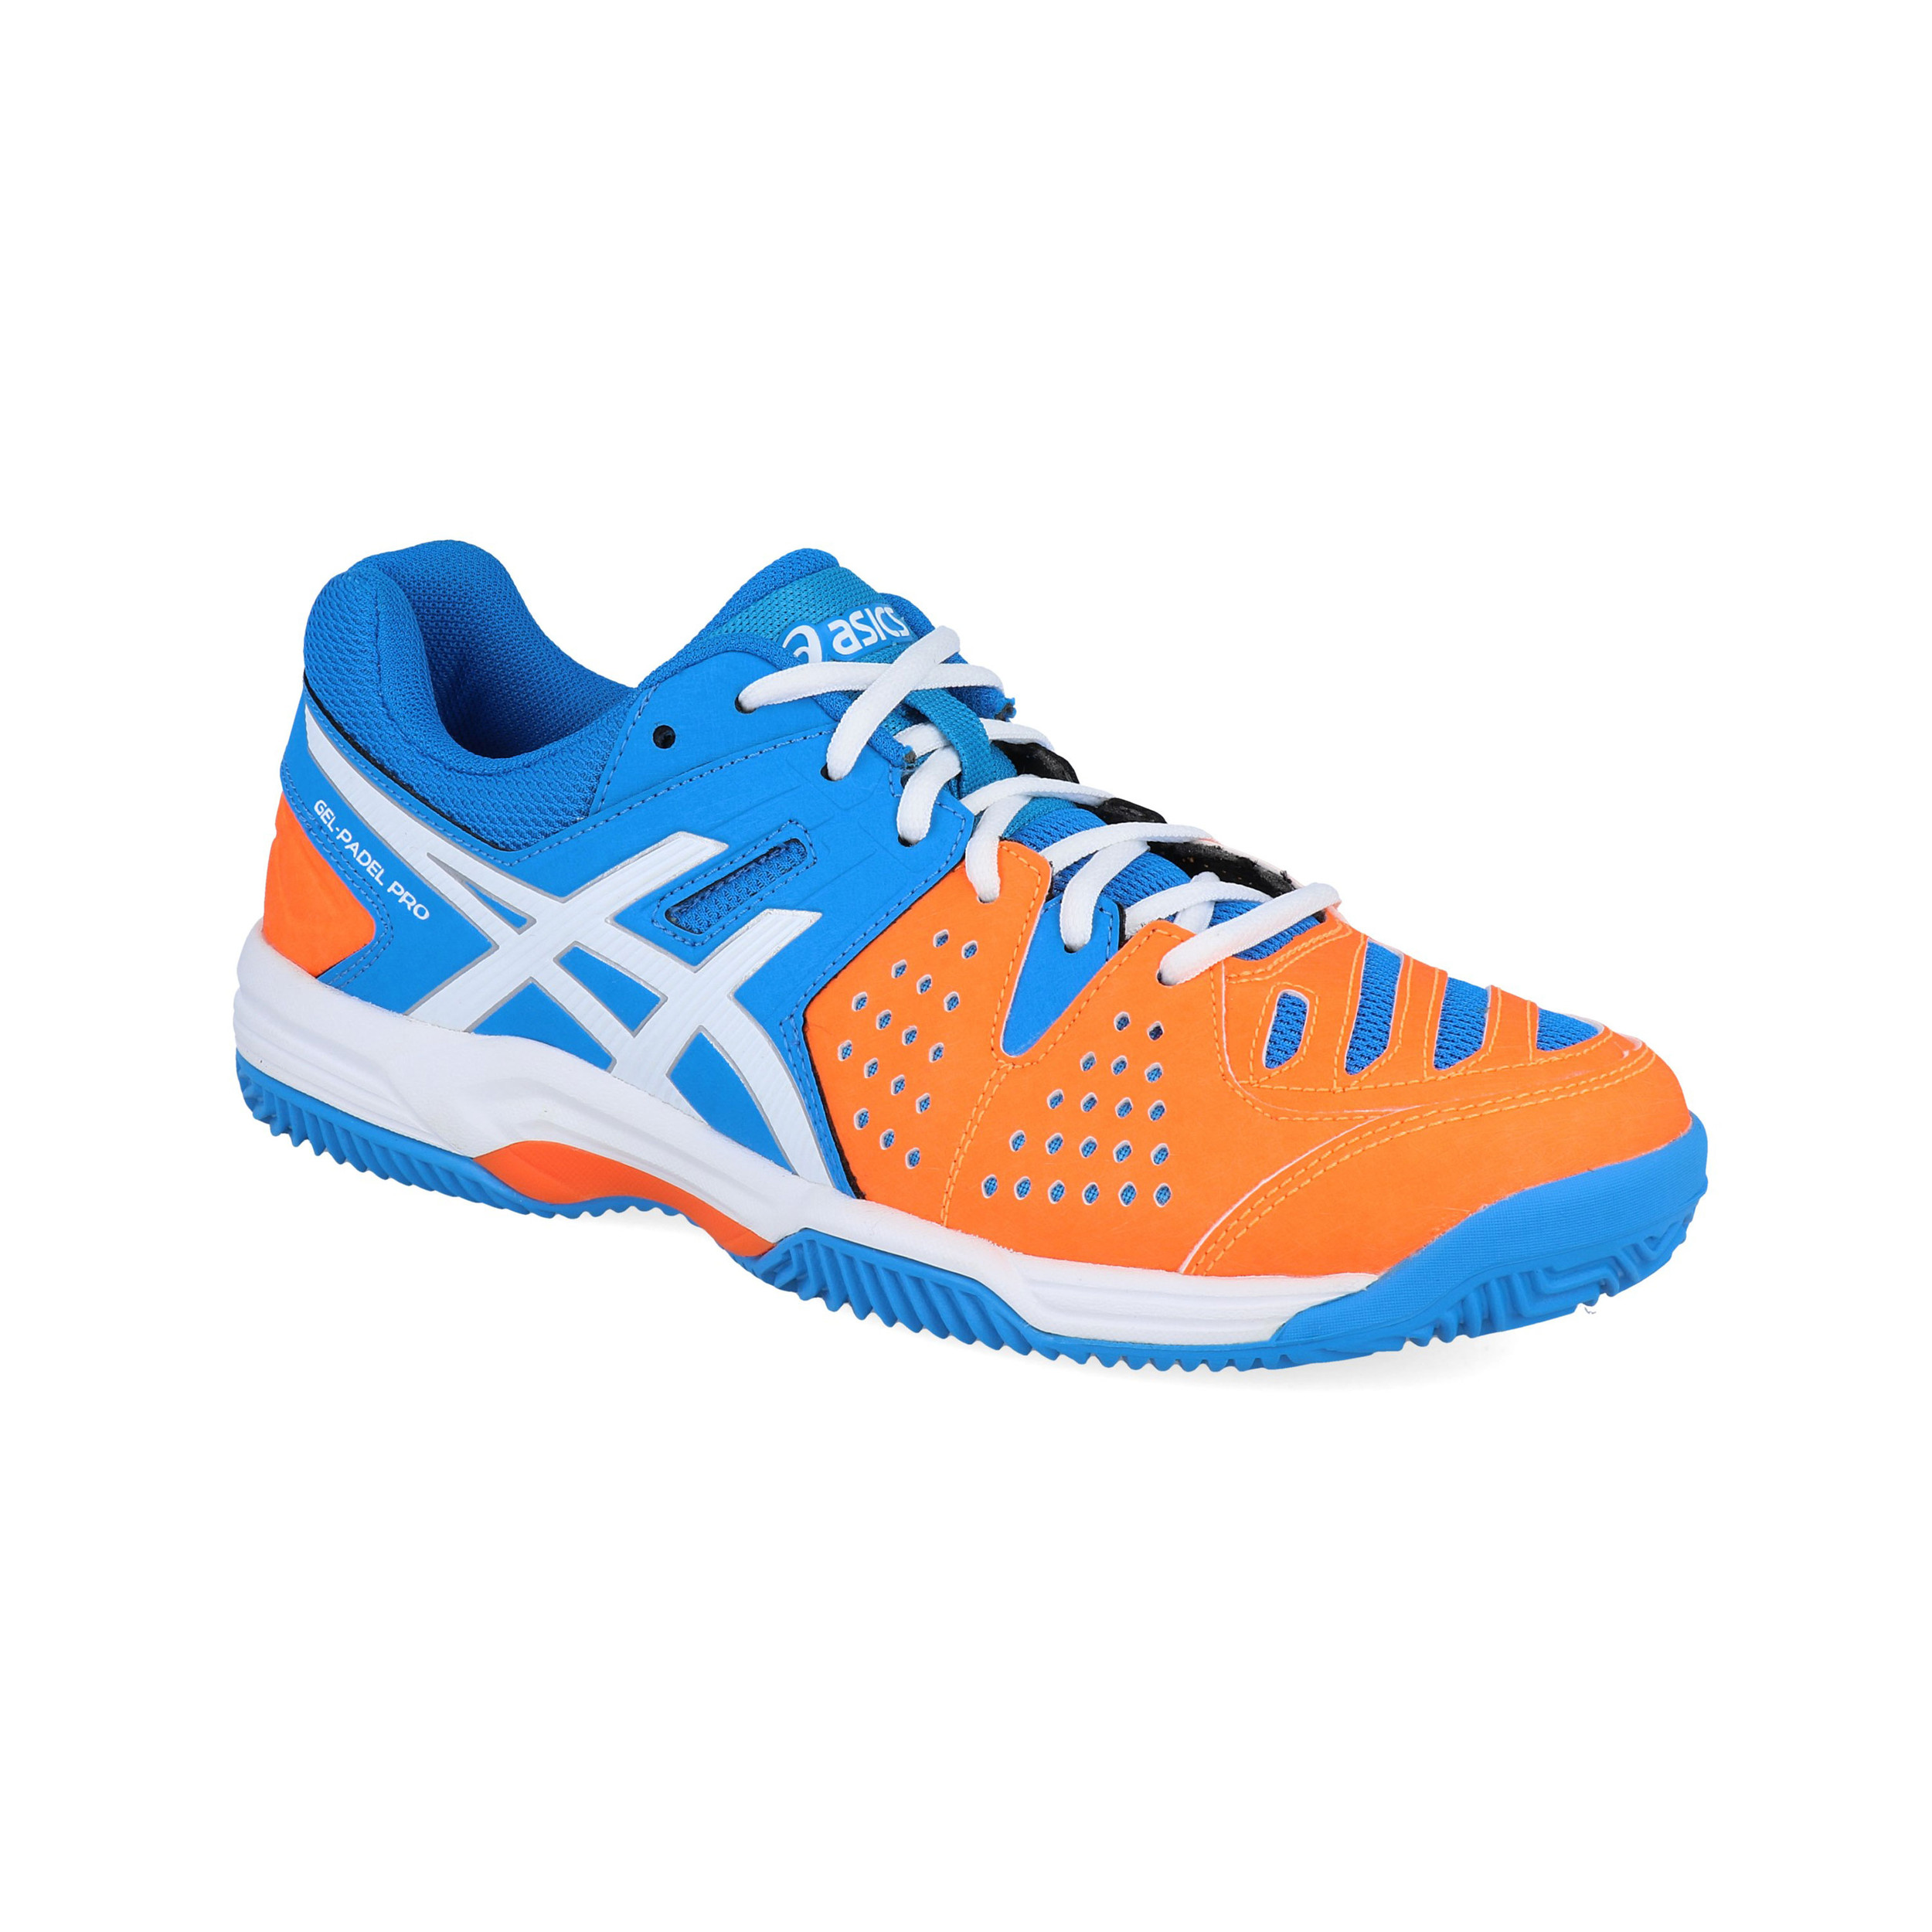 1138e8d225443a Asics Mens Gel-Padel Pro 3 Tennis Shoes Blue Orange Sports ...